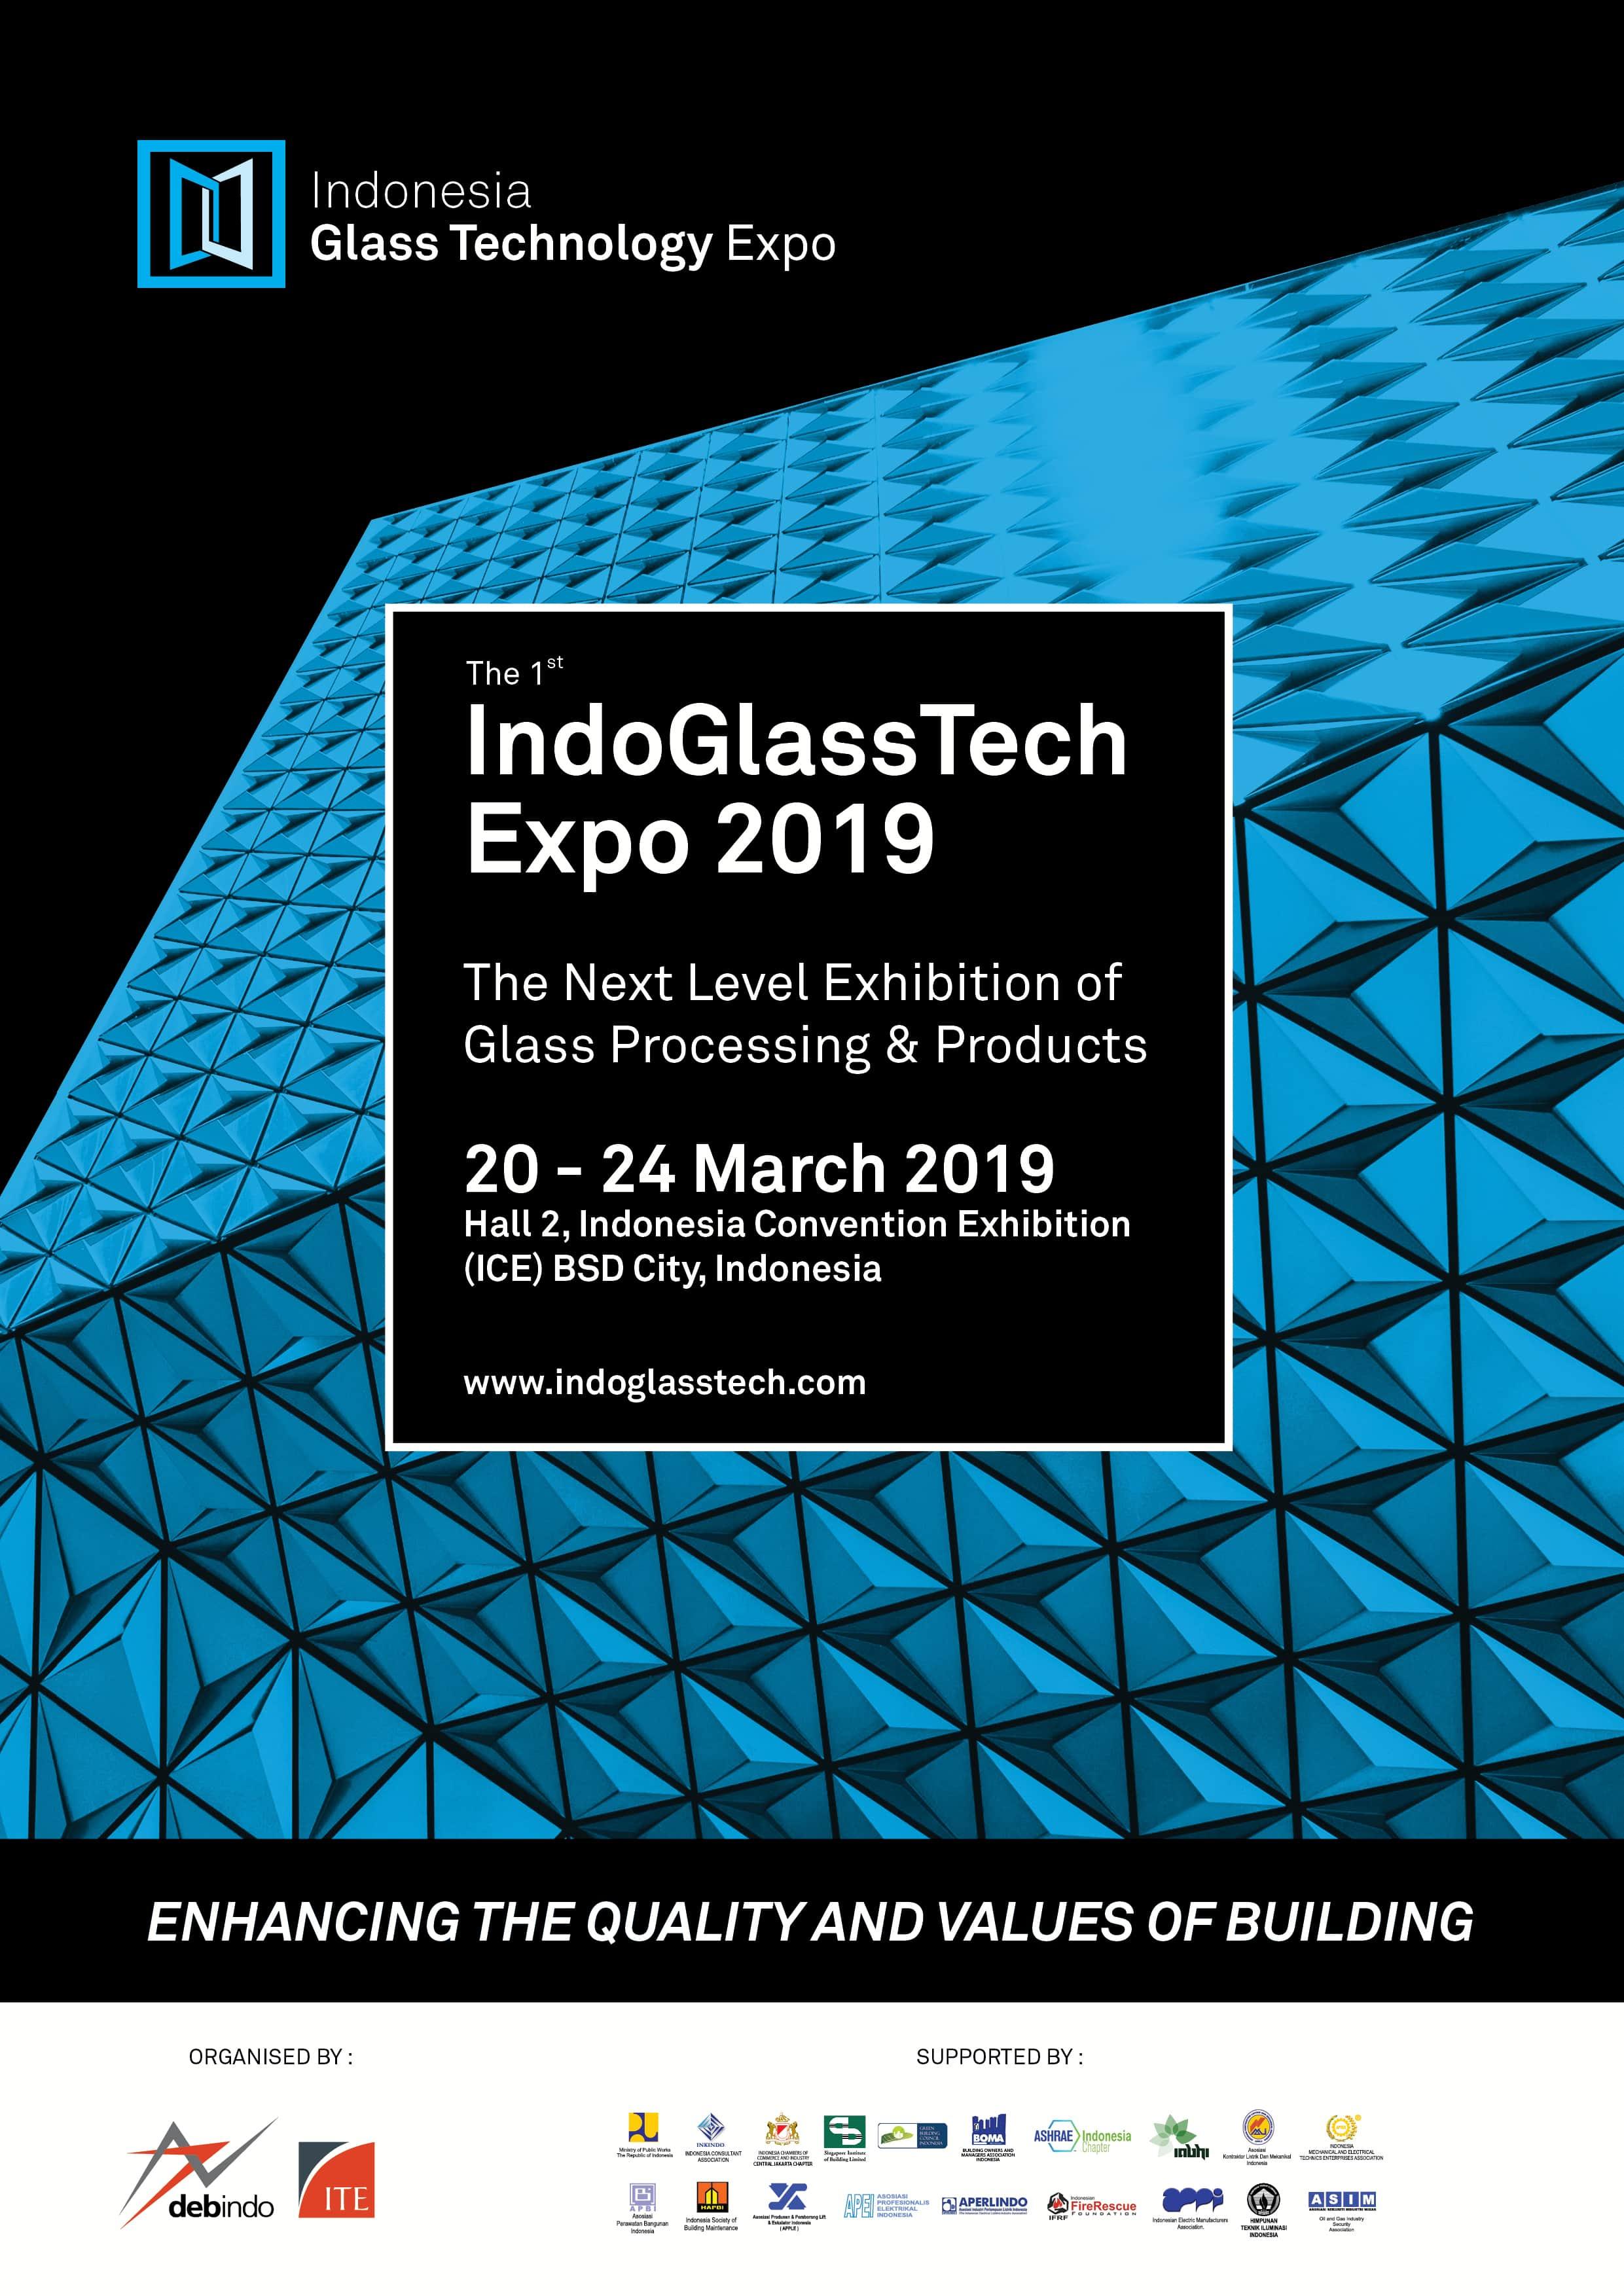 IndoGlassTech Expo, BSD city, Jakarta, Indonesia